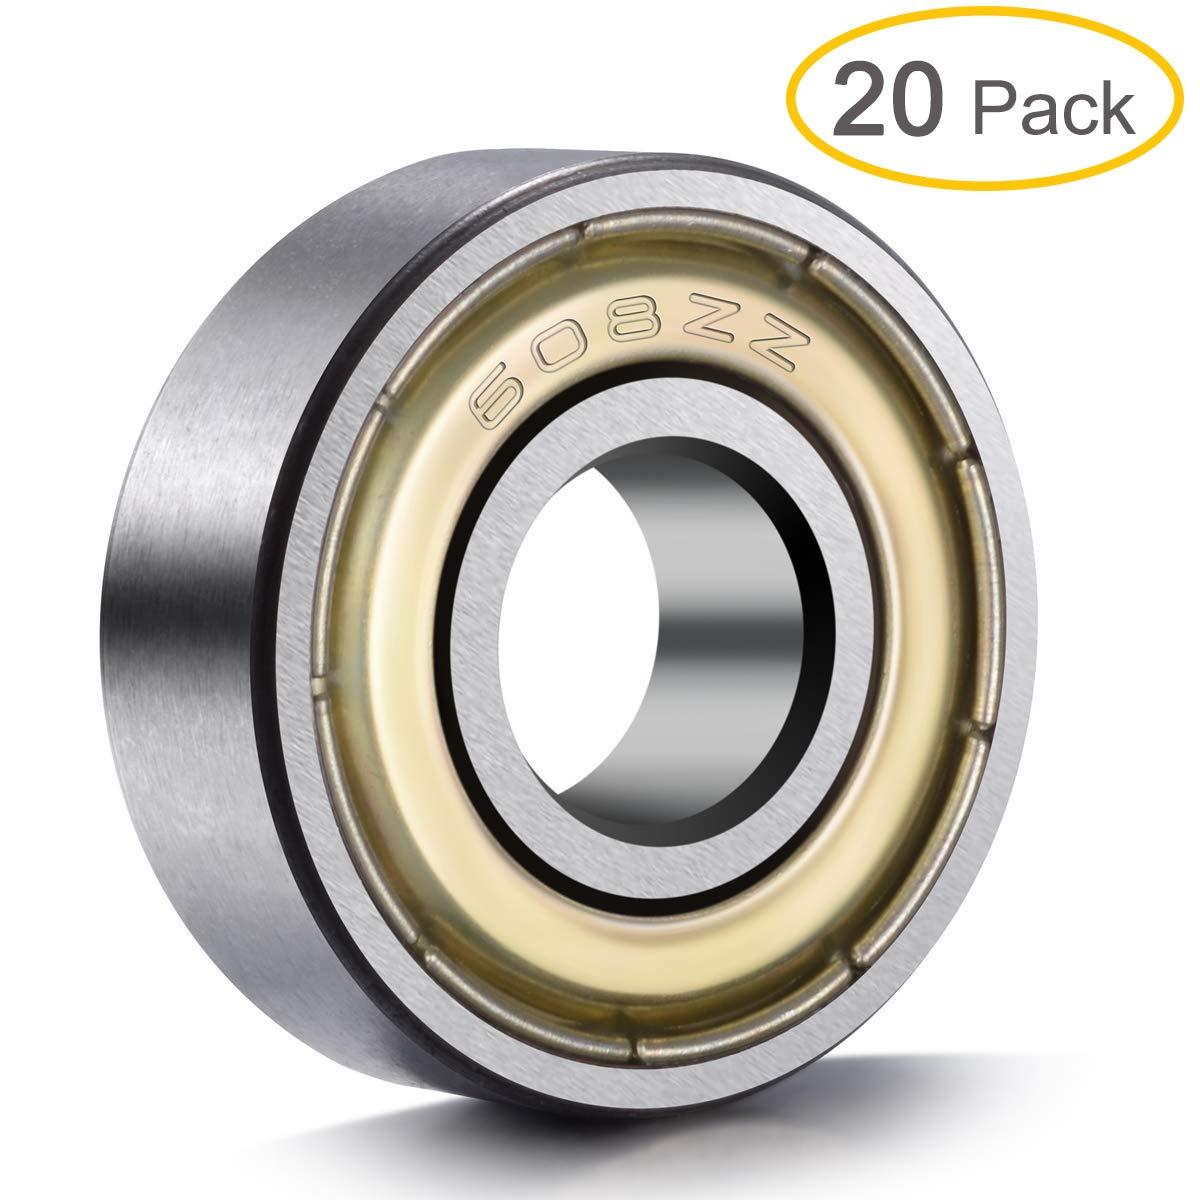 ball bearings for sale